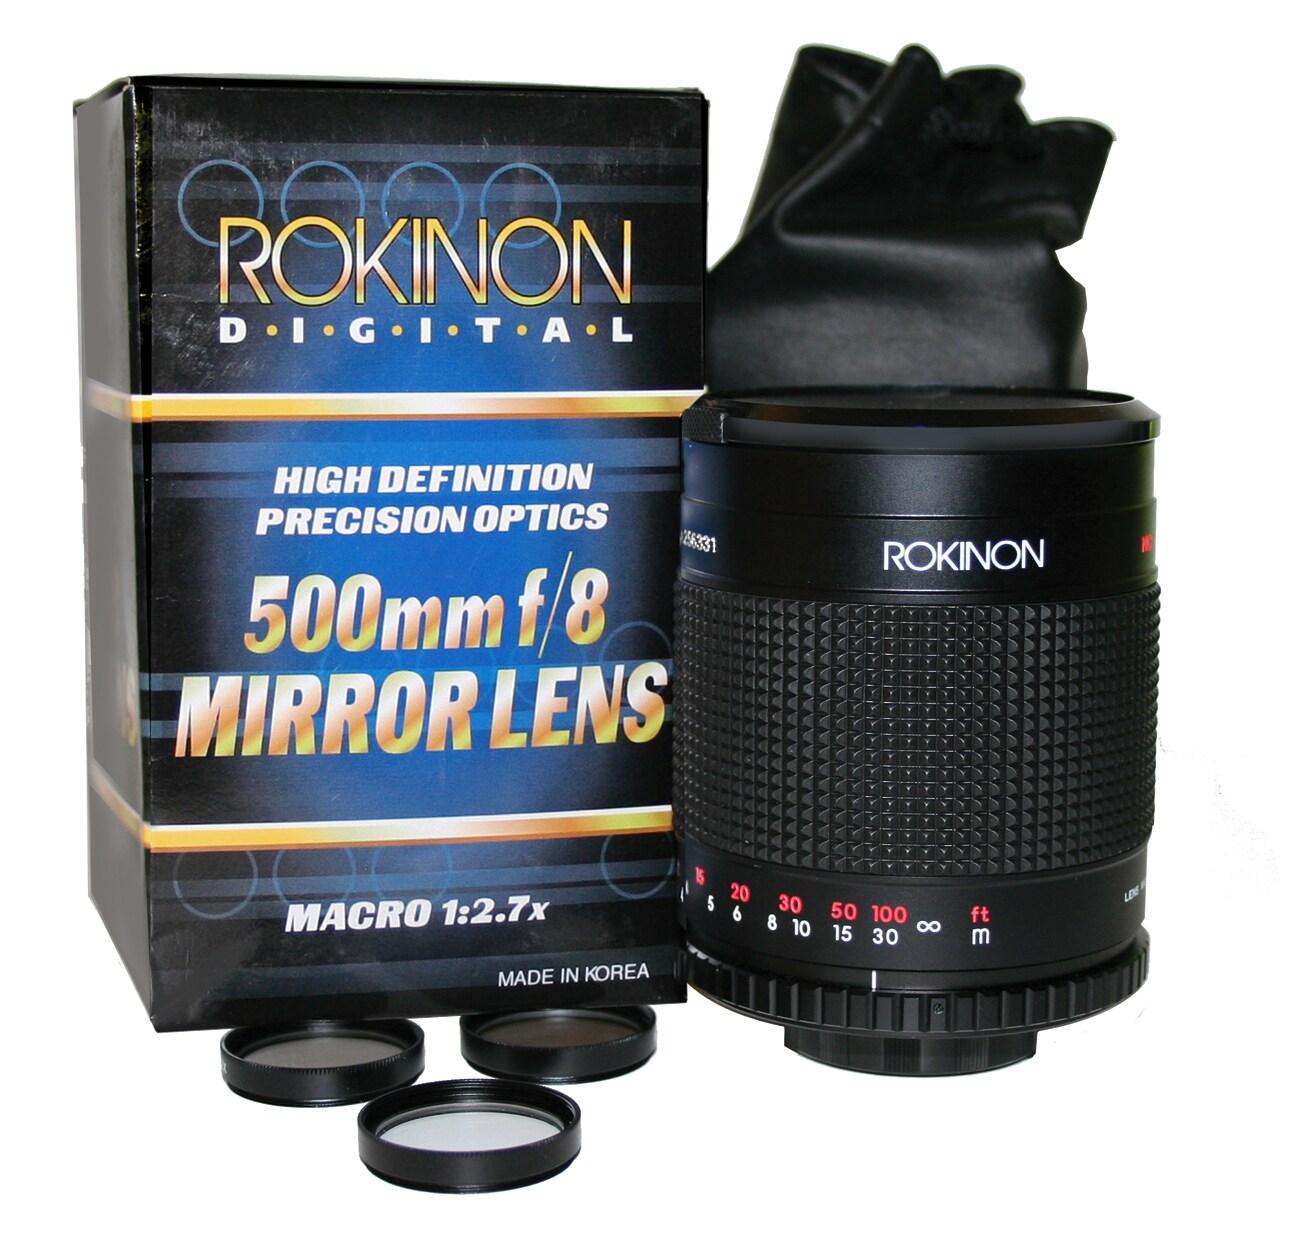 Rokinon 500mm/ 1000mm Mirror Lens for Sony Alpha